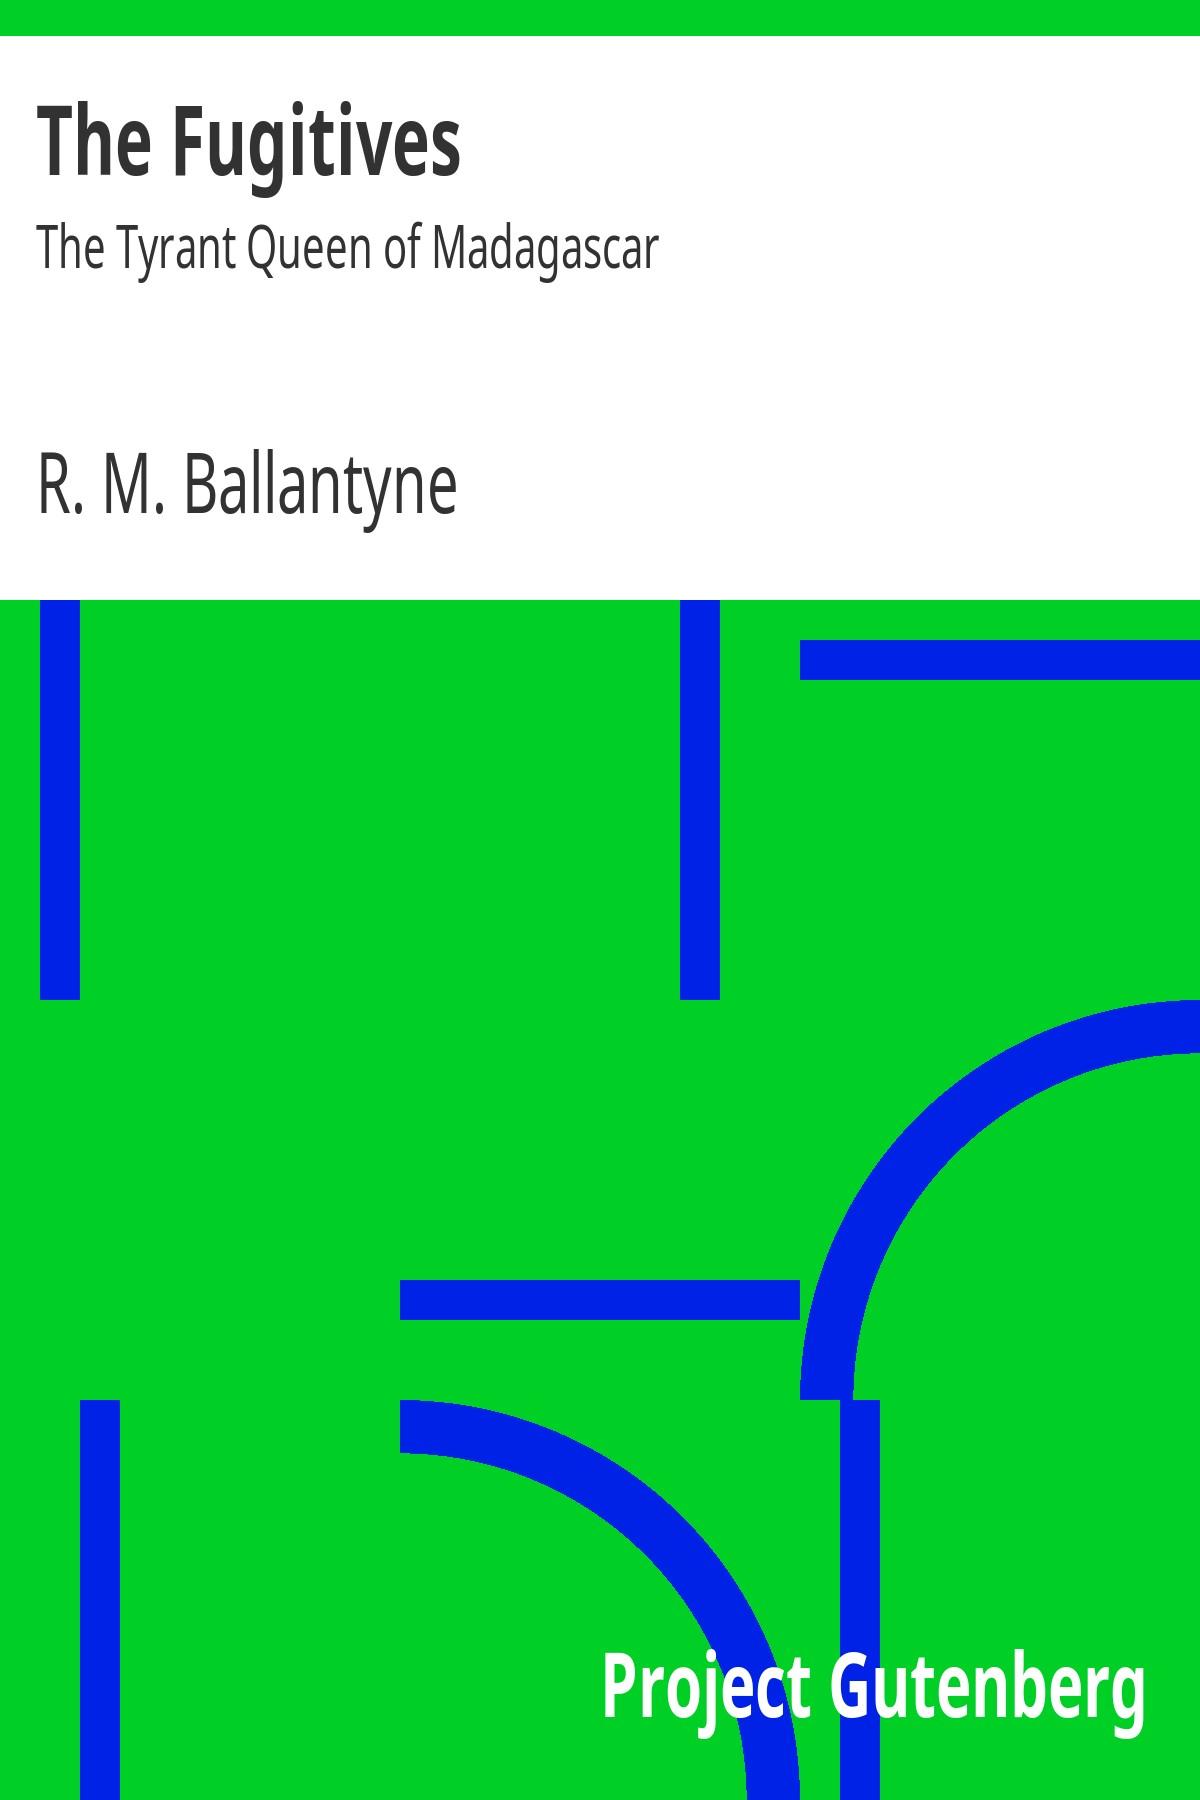 R. M. Ballantyne The Fugitives: The Tyrant Queen of Madagascar